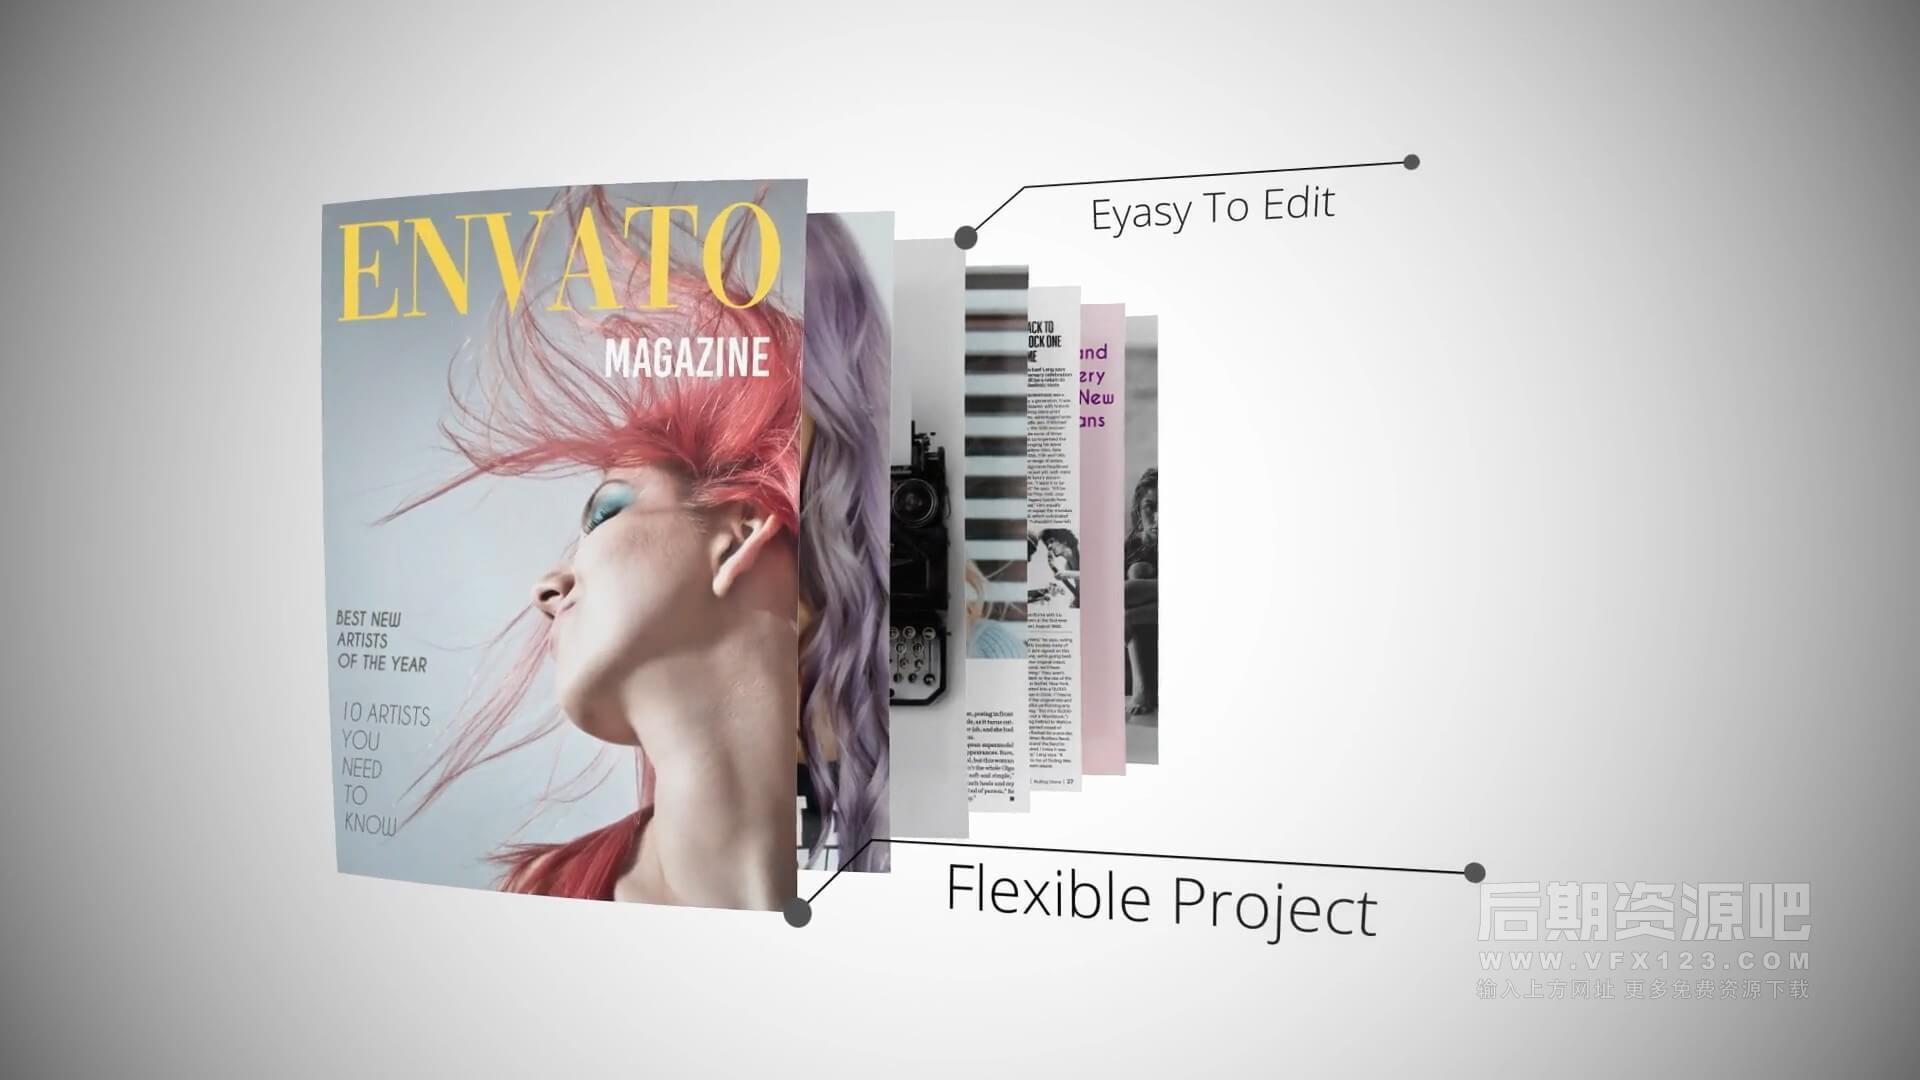 AE模板 杂志动画效果专业版图文展示片头 Magazine Animation Pro V2